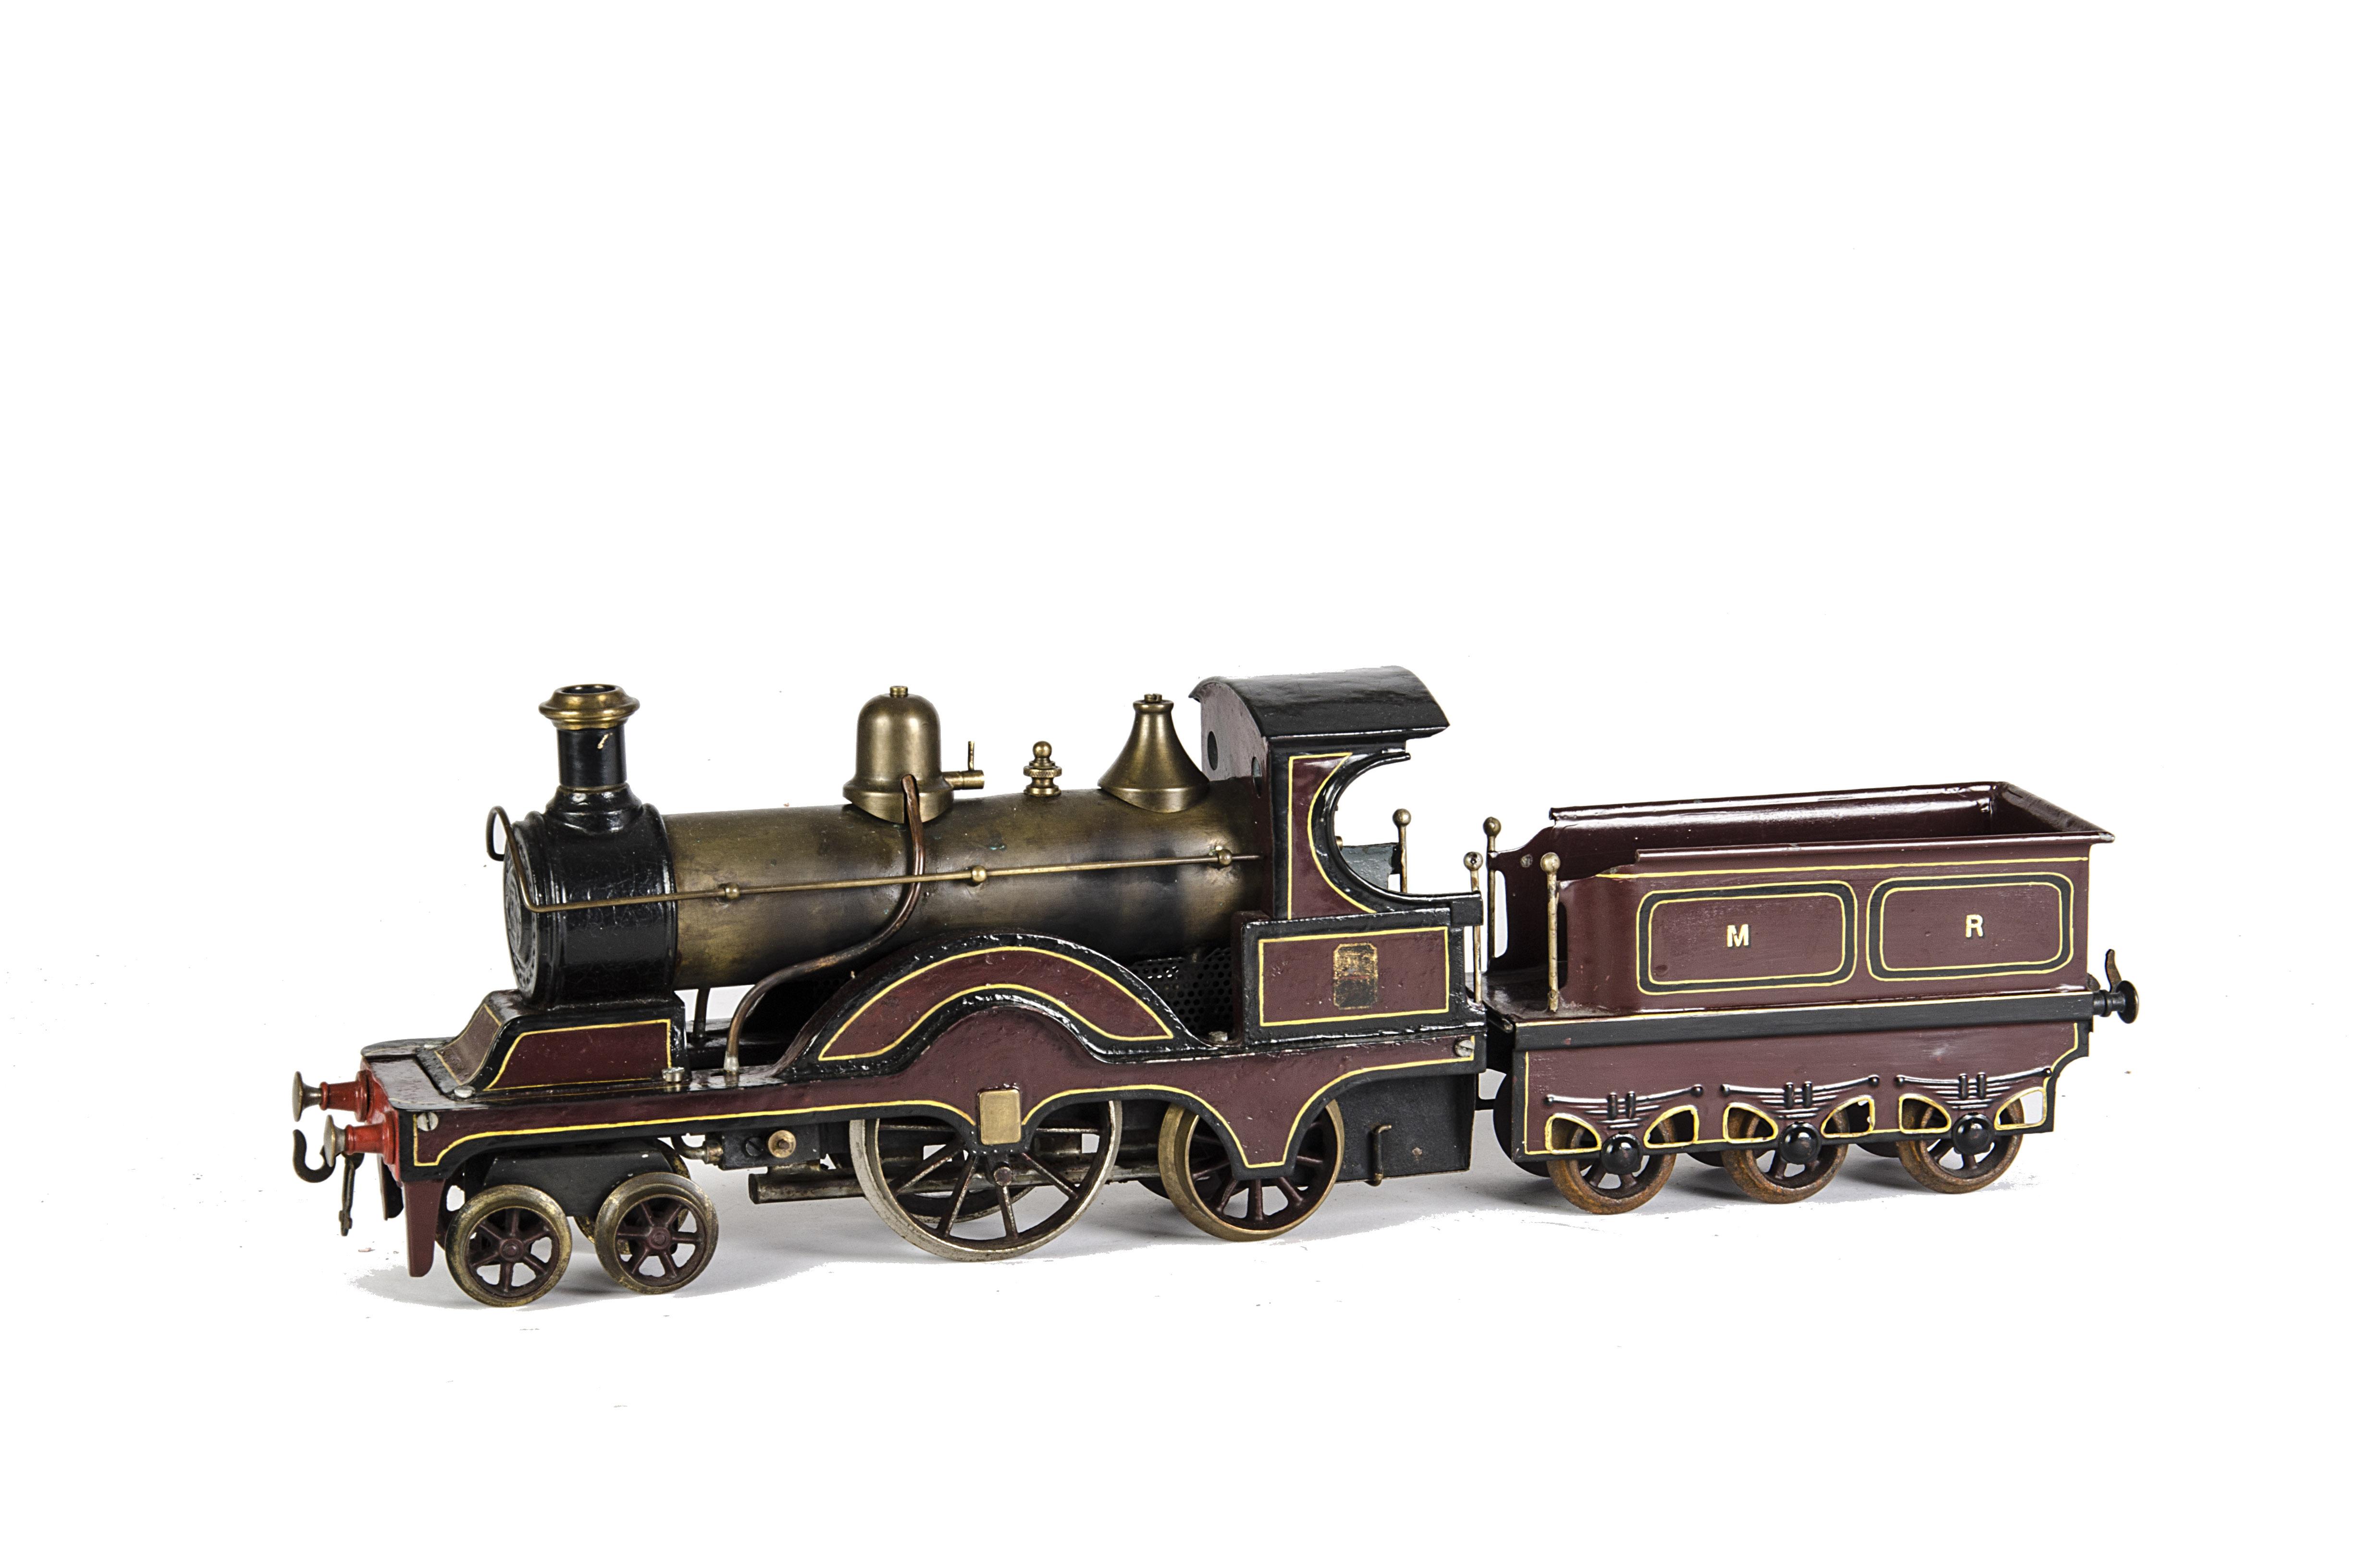 Lot 1092 - A Substantially-Repainted Bing Gauge 2 spirit-fired Midland Railway Locomotive 4-2-2 and Tender,